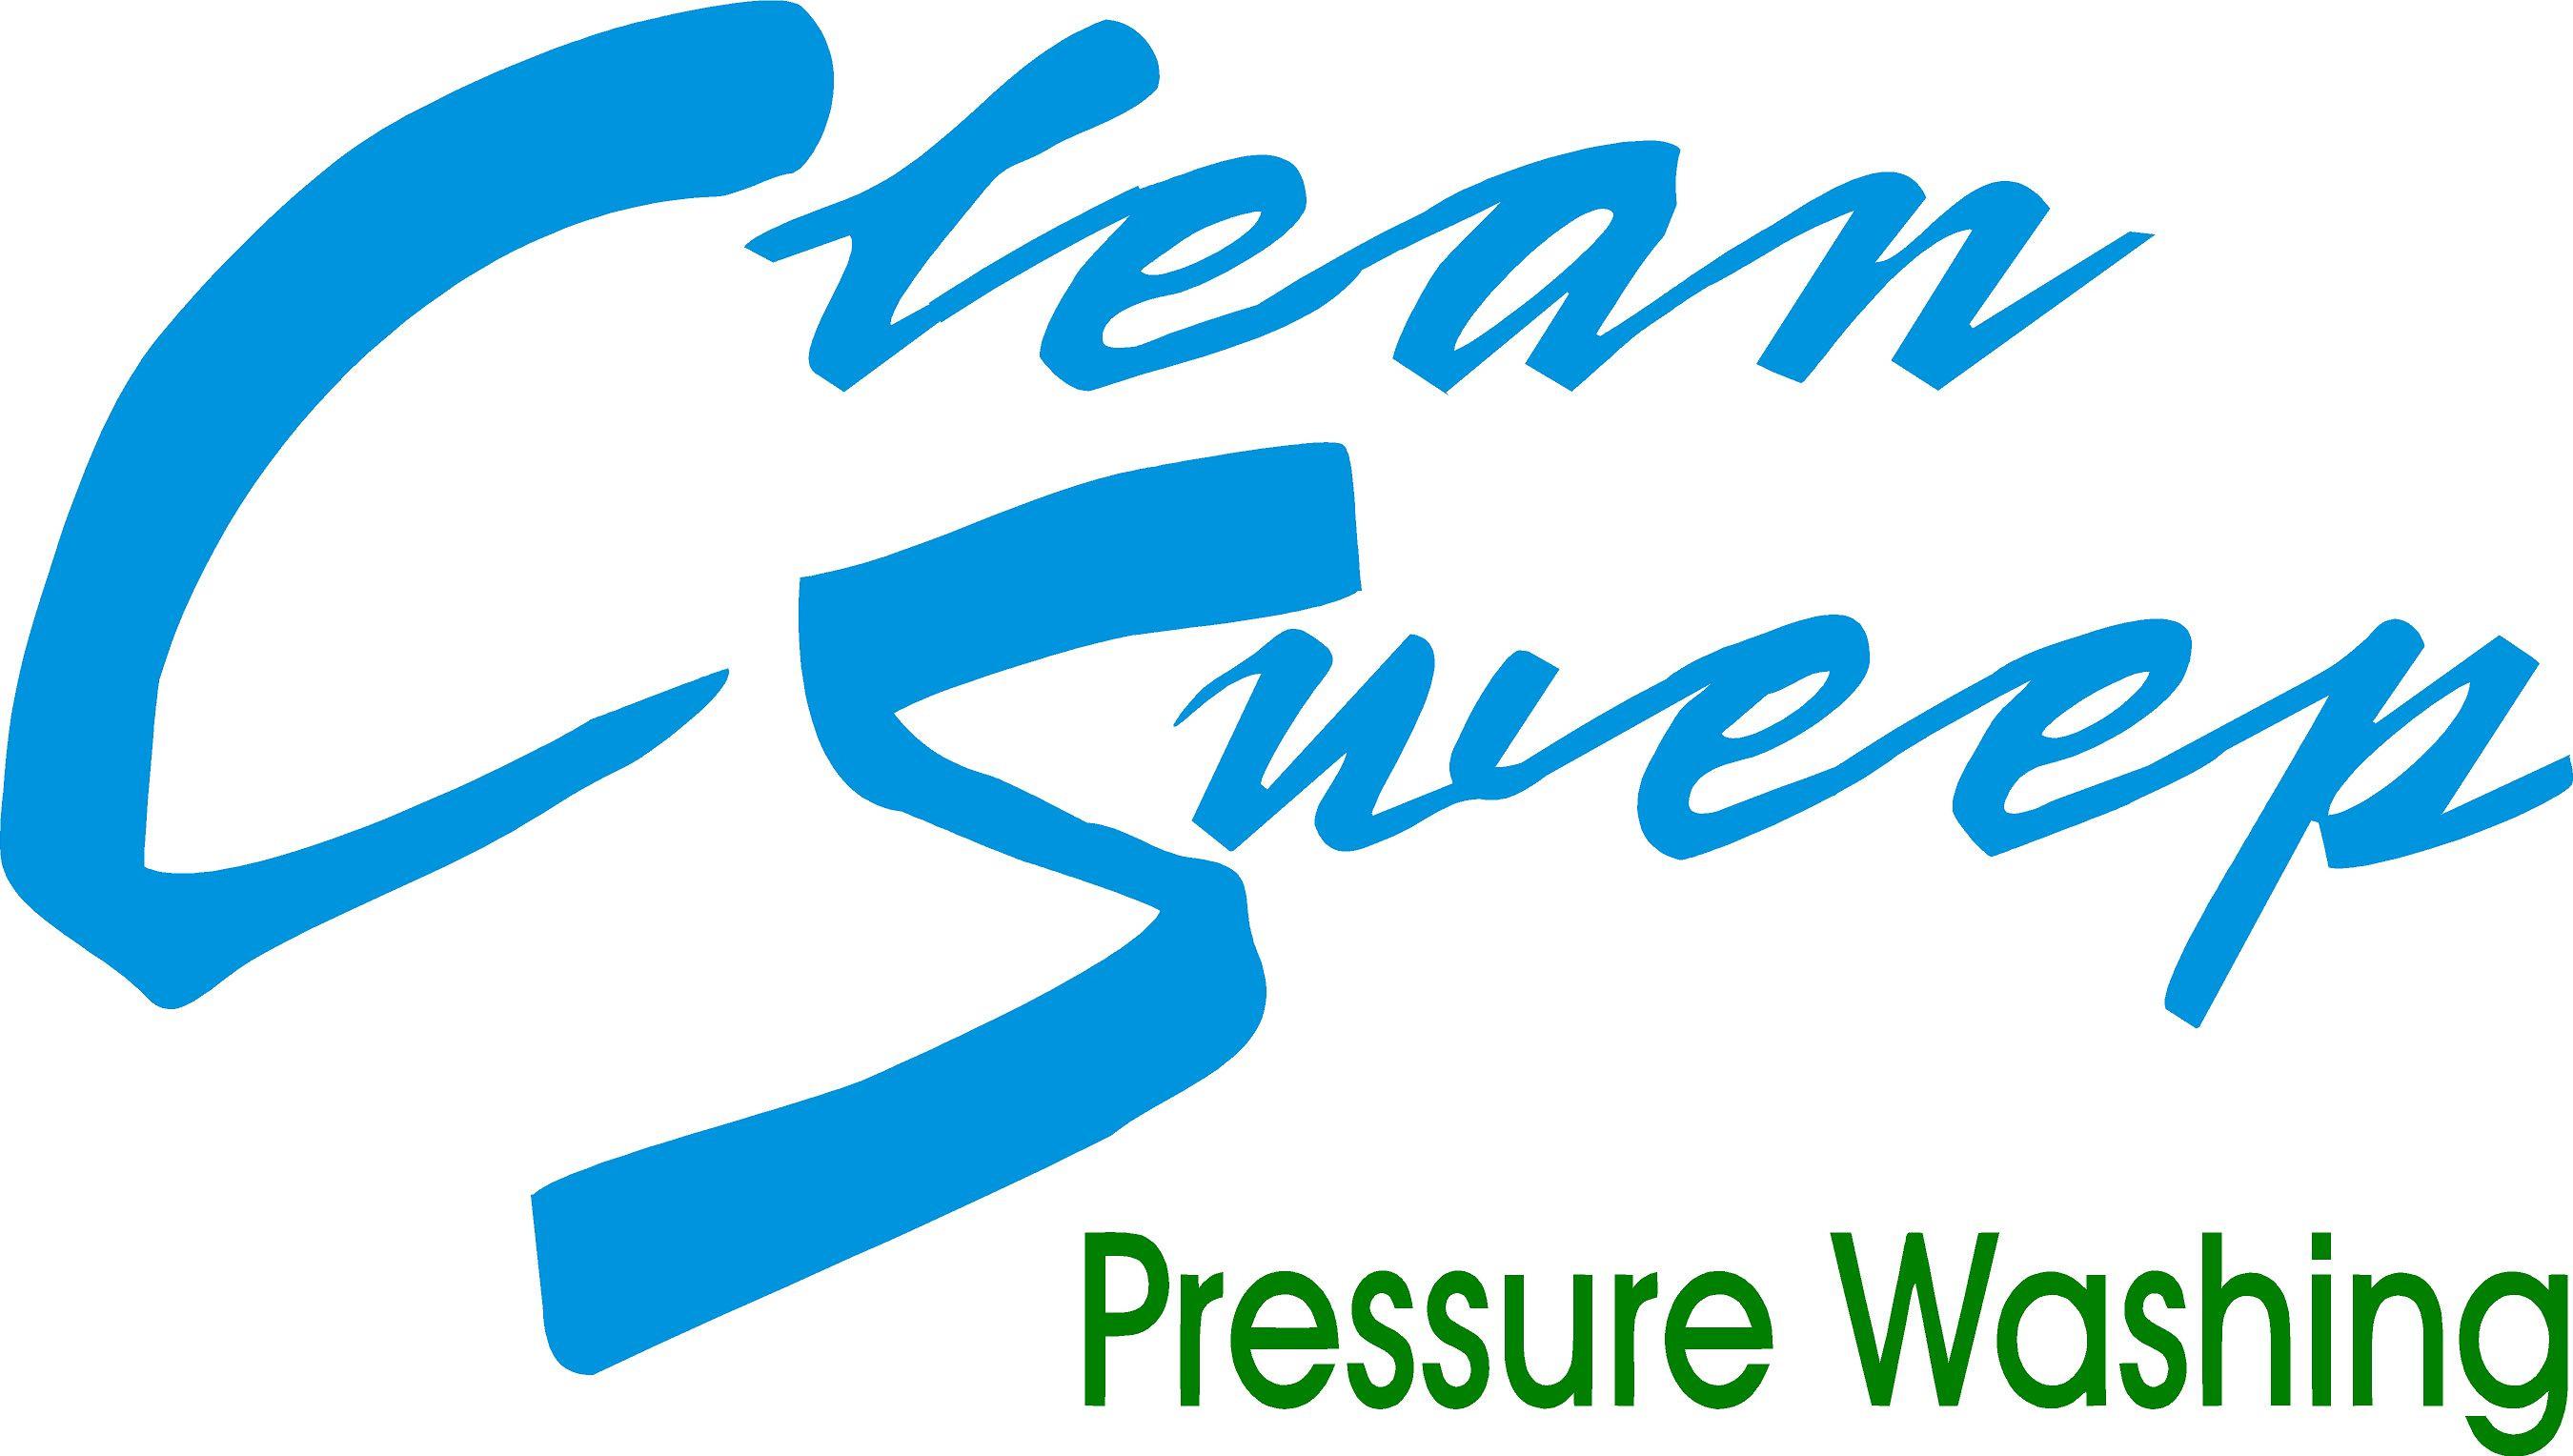 Clean Sweep Pressure Washing